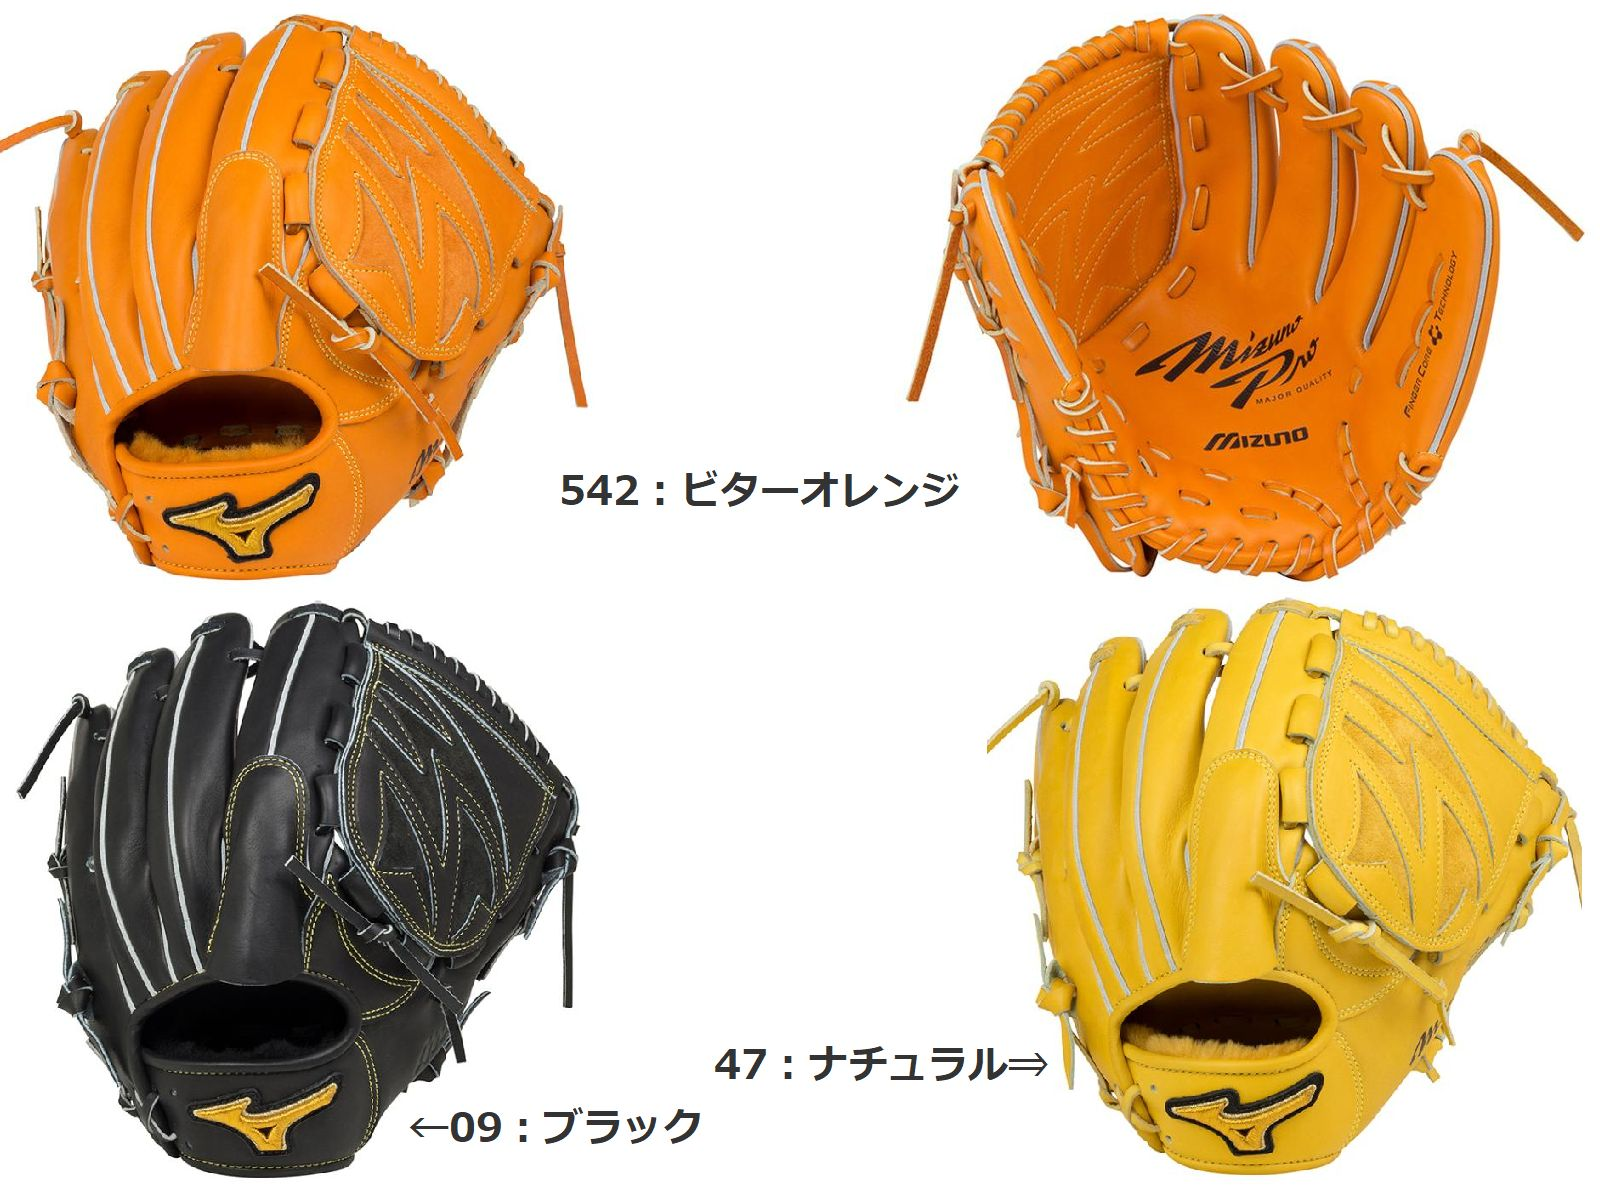 【Mizuno PRO=ミズノプロ】野球 一般 硬式用 グラブ グローブ<フィンガーコアテクノロジー【投手用3(タイト設計タイプ)】【ジェネラルキップレザー】>[ヨコ型タイプ](サイズ:10)<ナチュラル/ビターオレンジ/ブラック>(右投用/左投用)